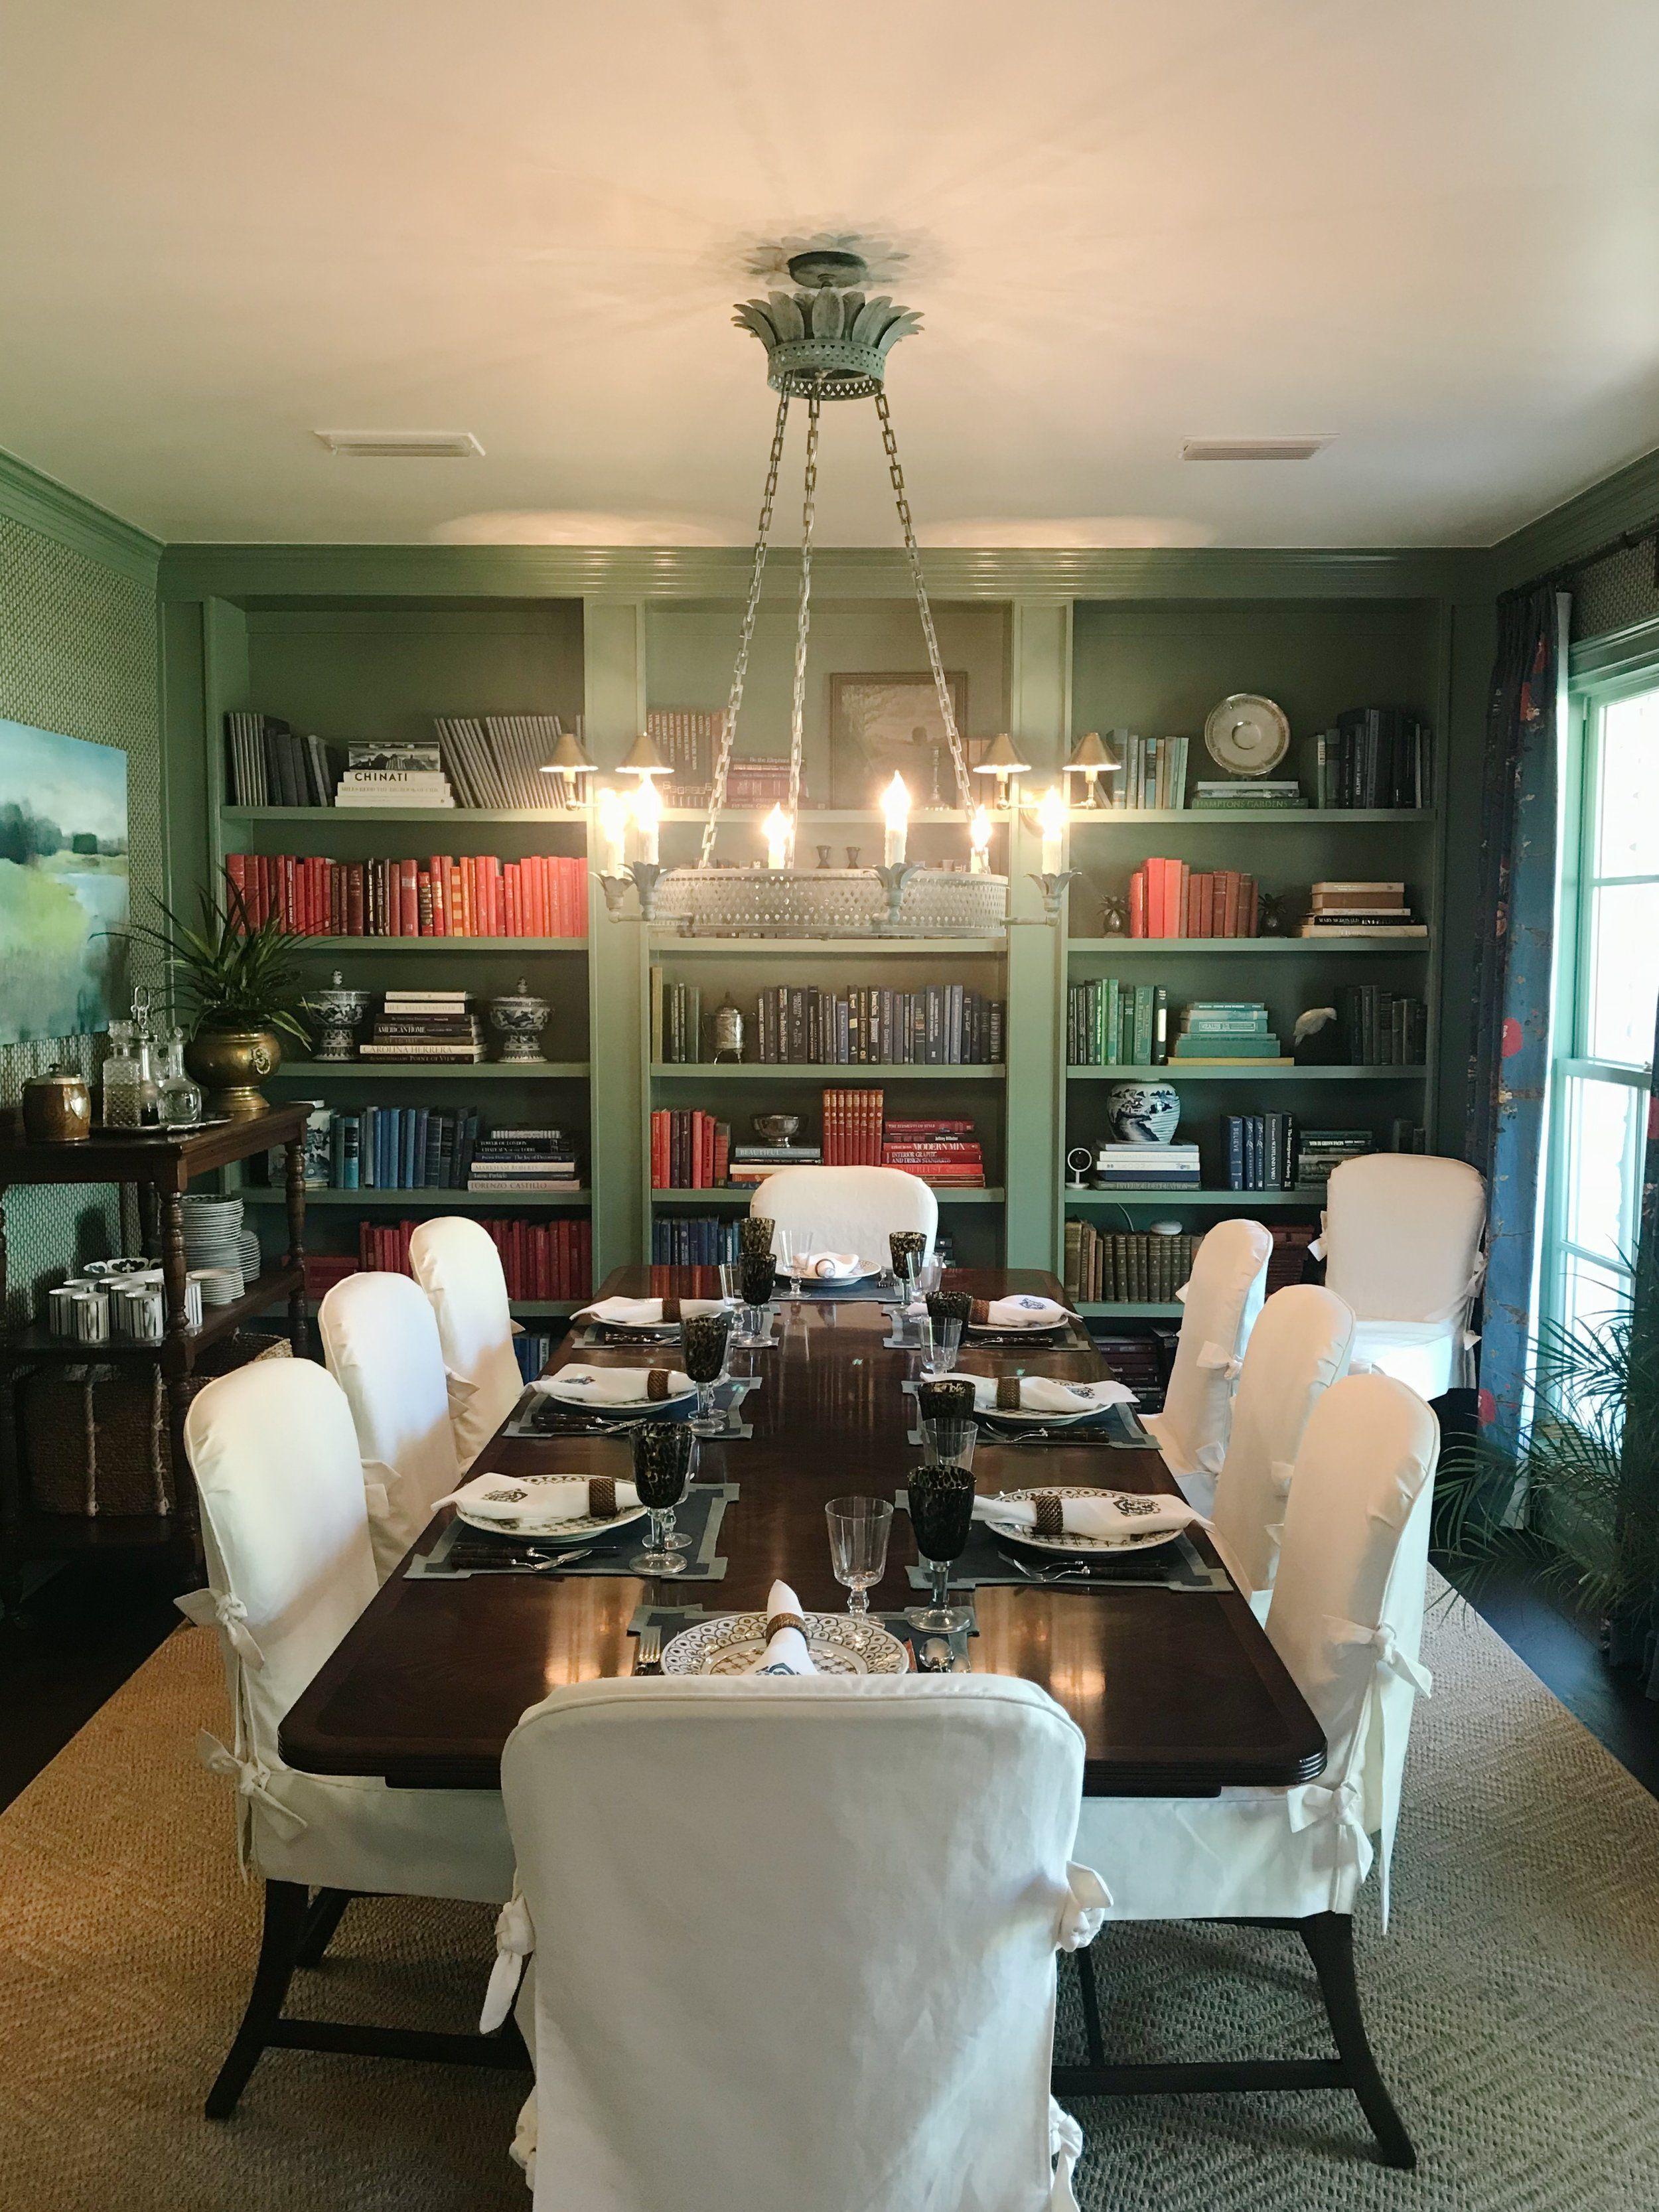 Southern Living 2018 Austin Idea House images